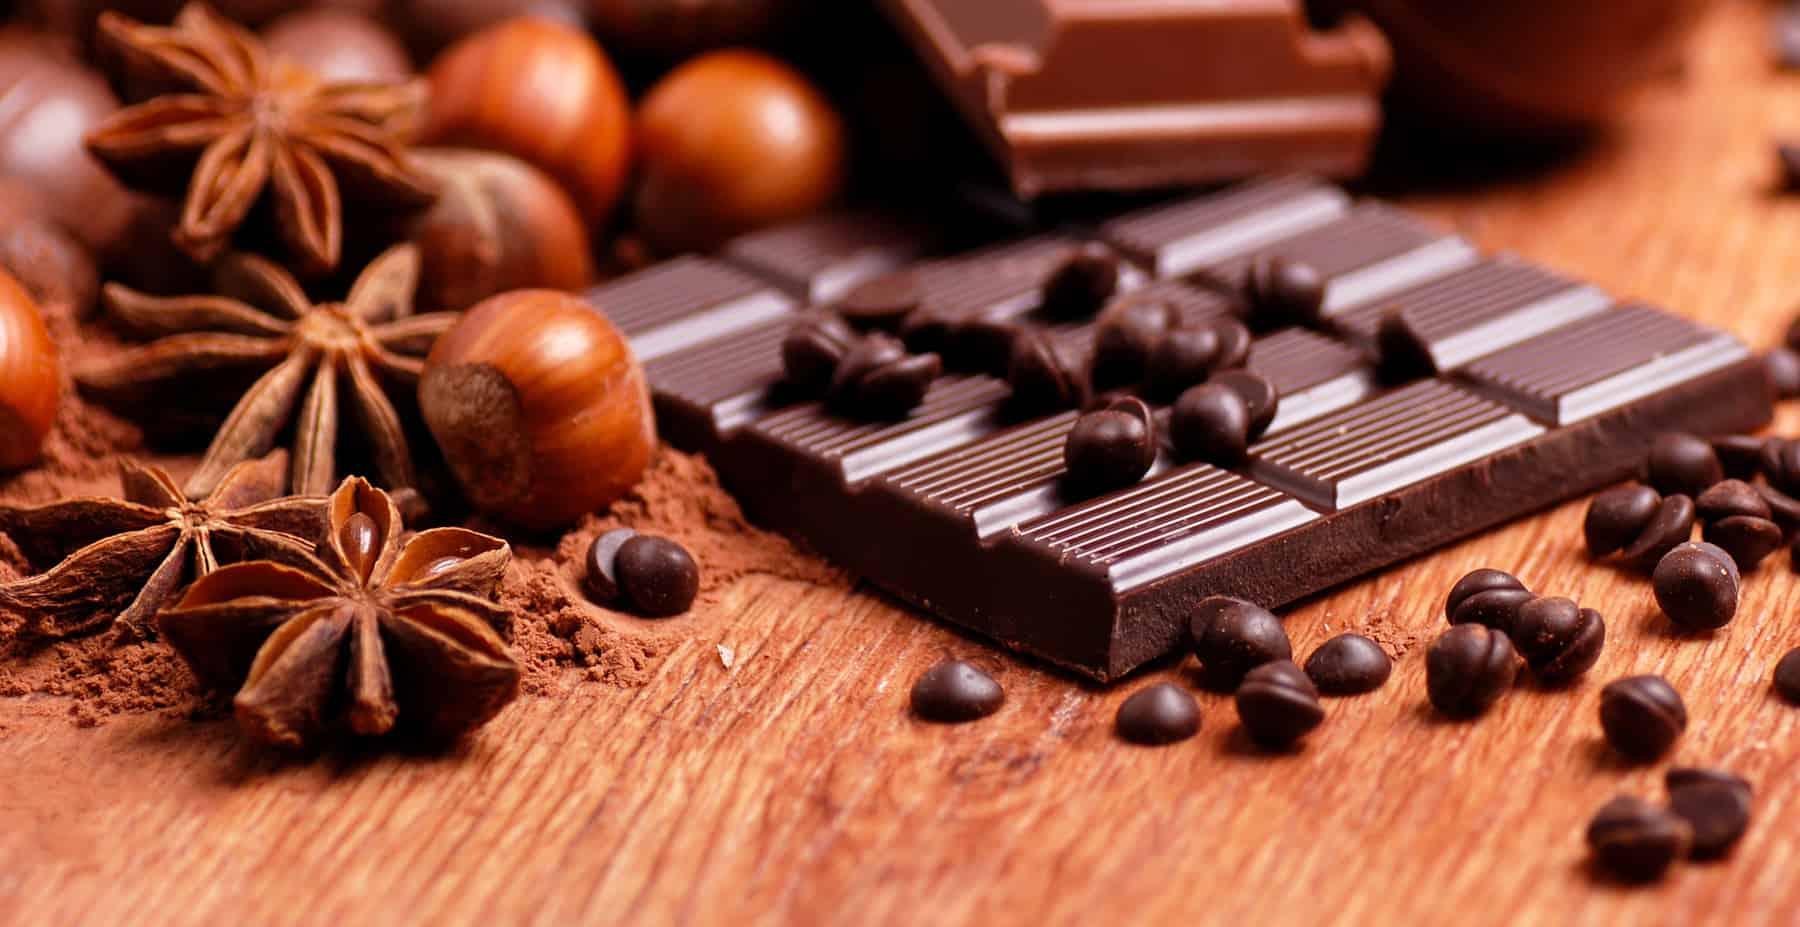 o-marche-gourmand-chocolat